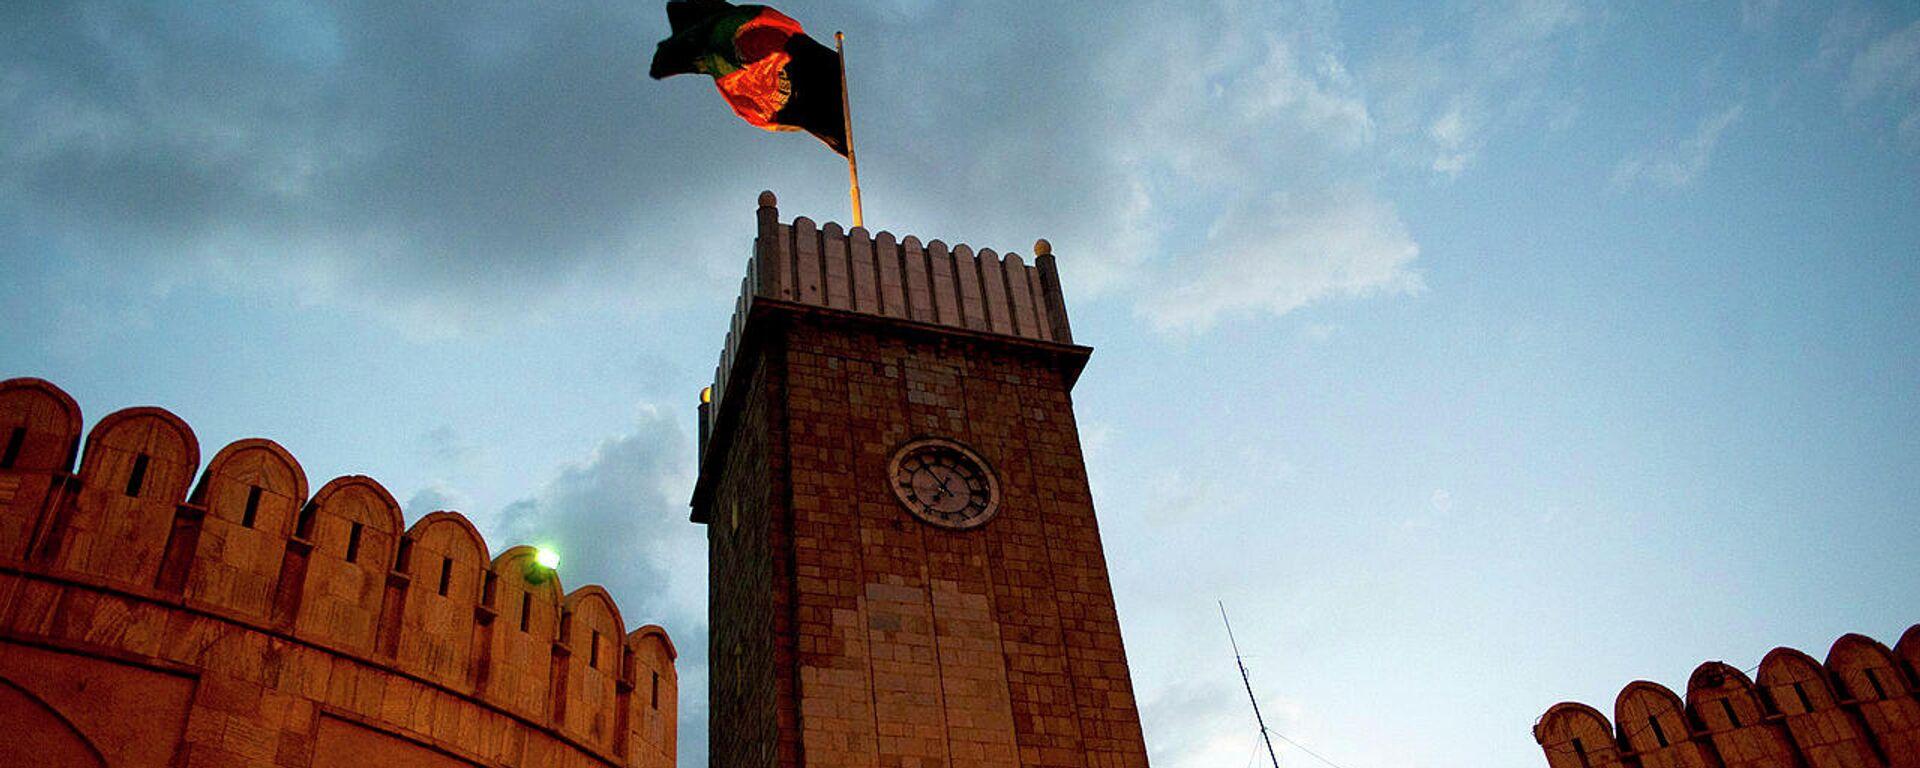 Palacio presidencial en Kabul, Afganistán - Sputnik Mundo, 1920, 20.07.2021